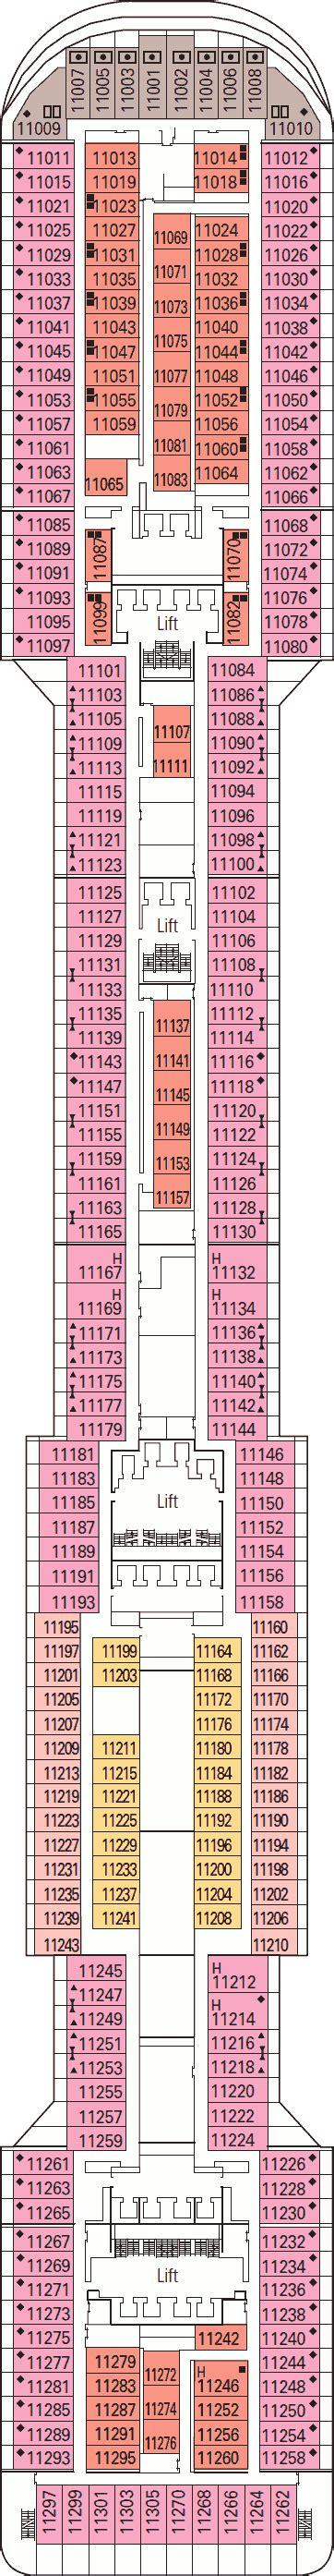 Msc Divina Deck Plan 11 by Msc Divina Deck Plans